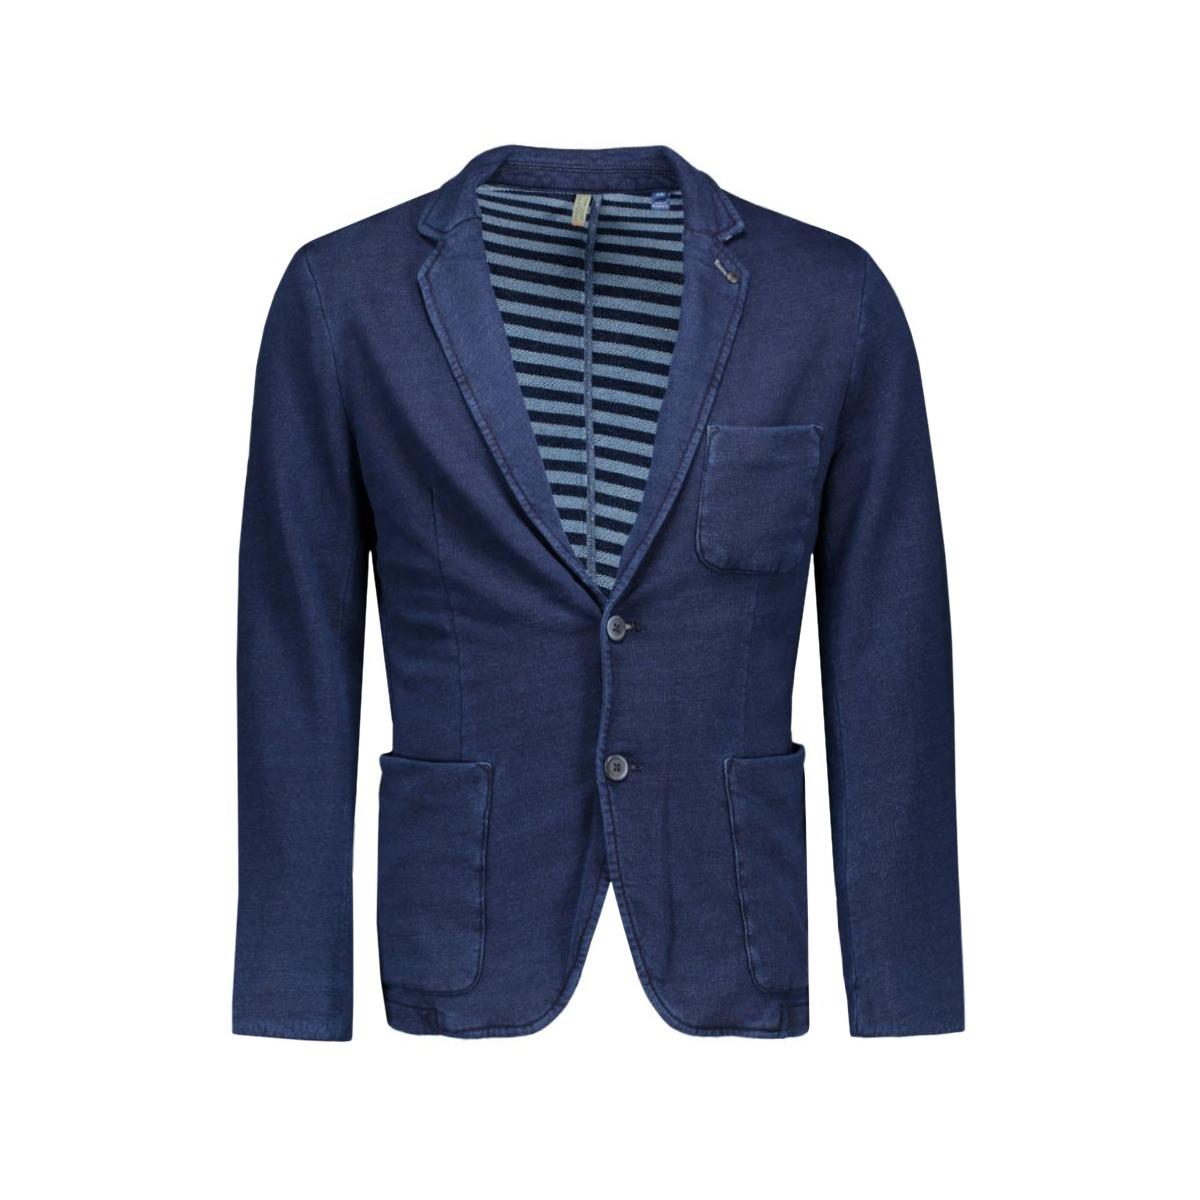 3922672.70.10 tom tailor colbert 6800